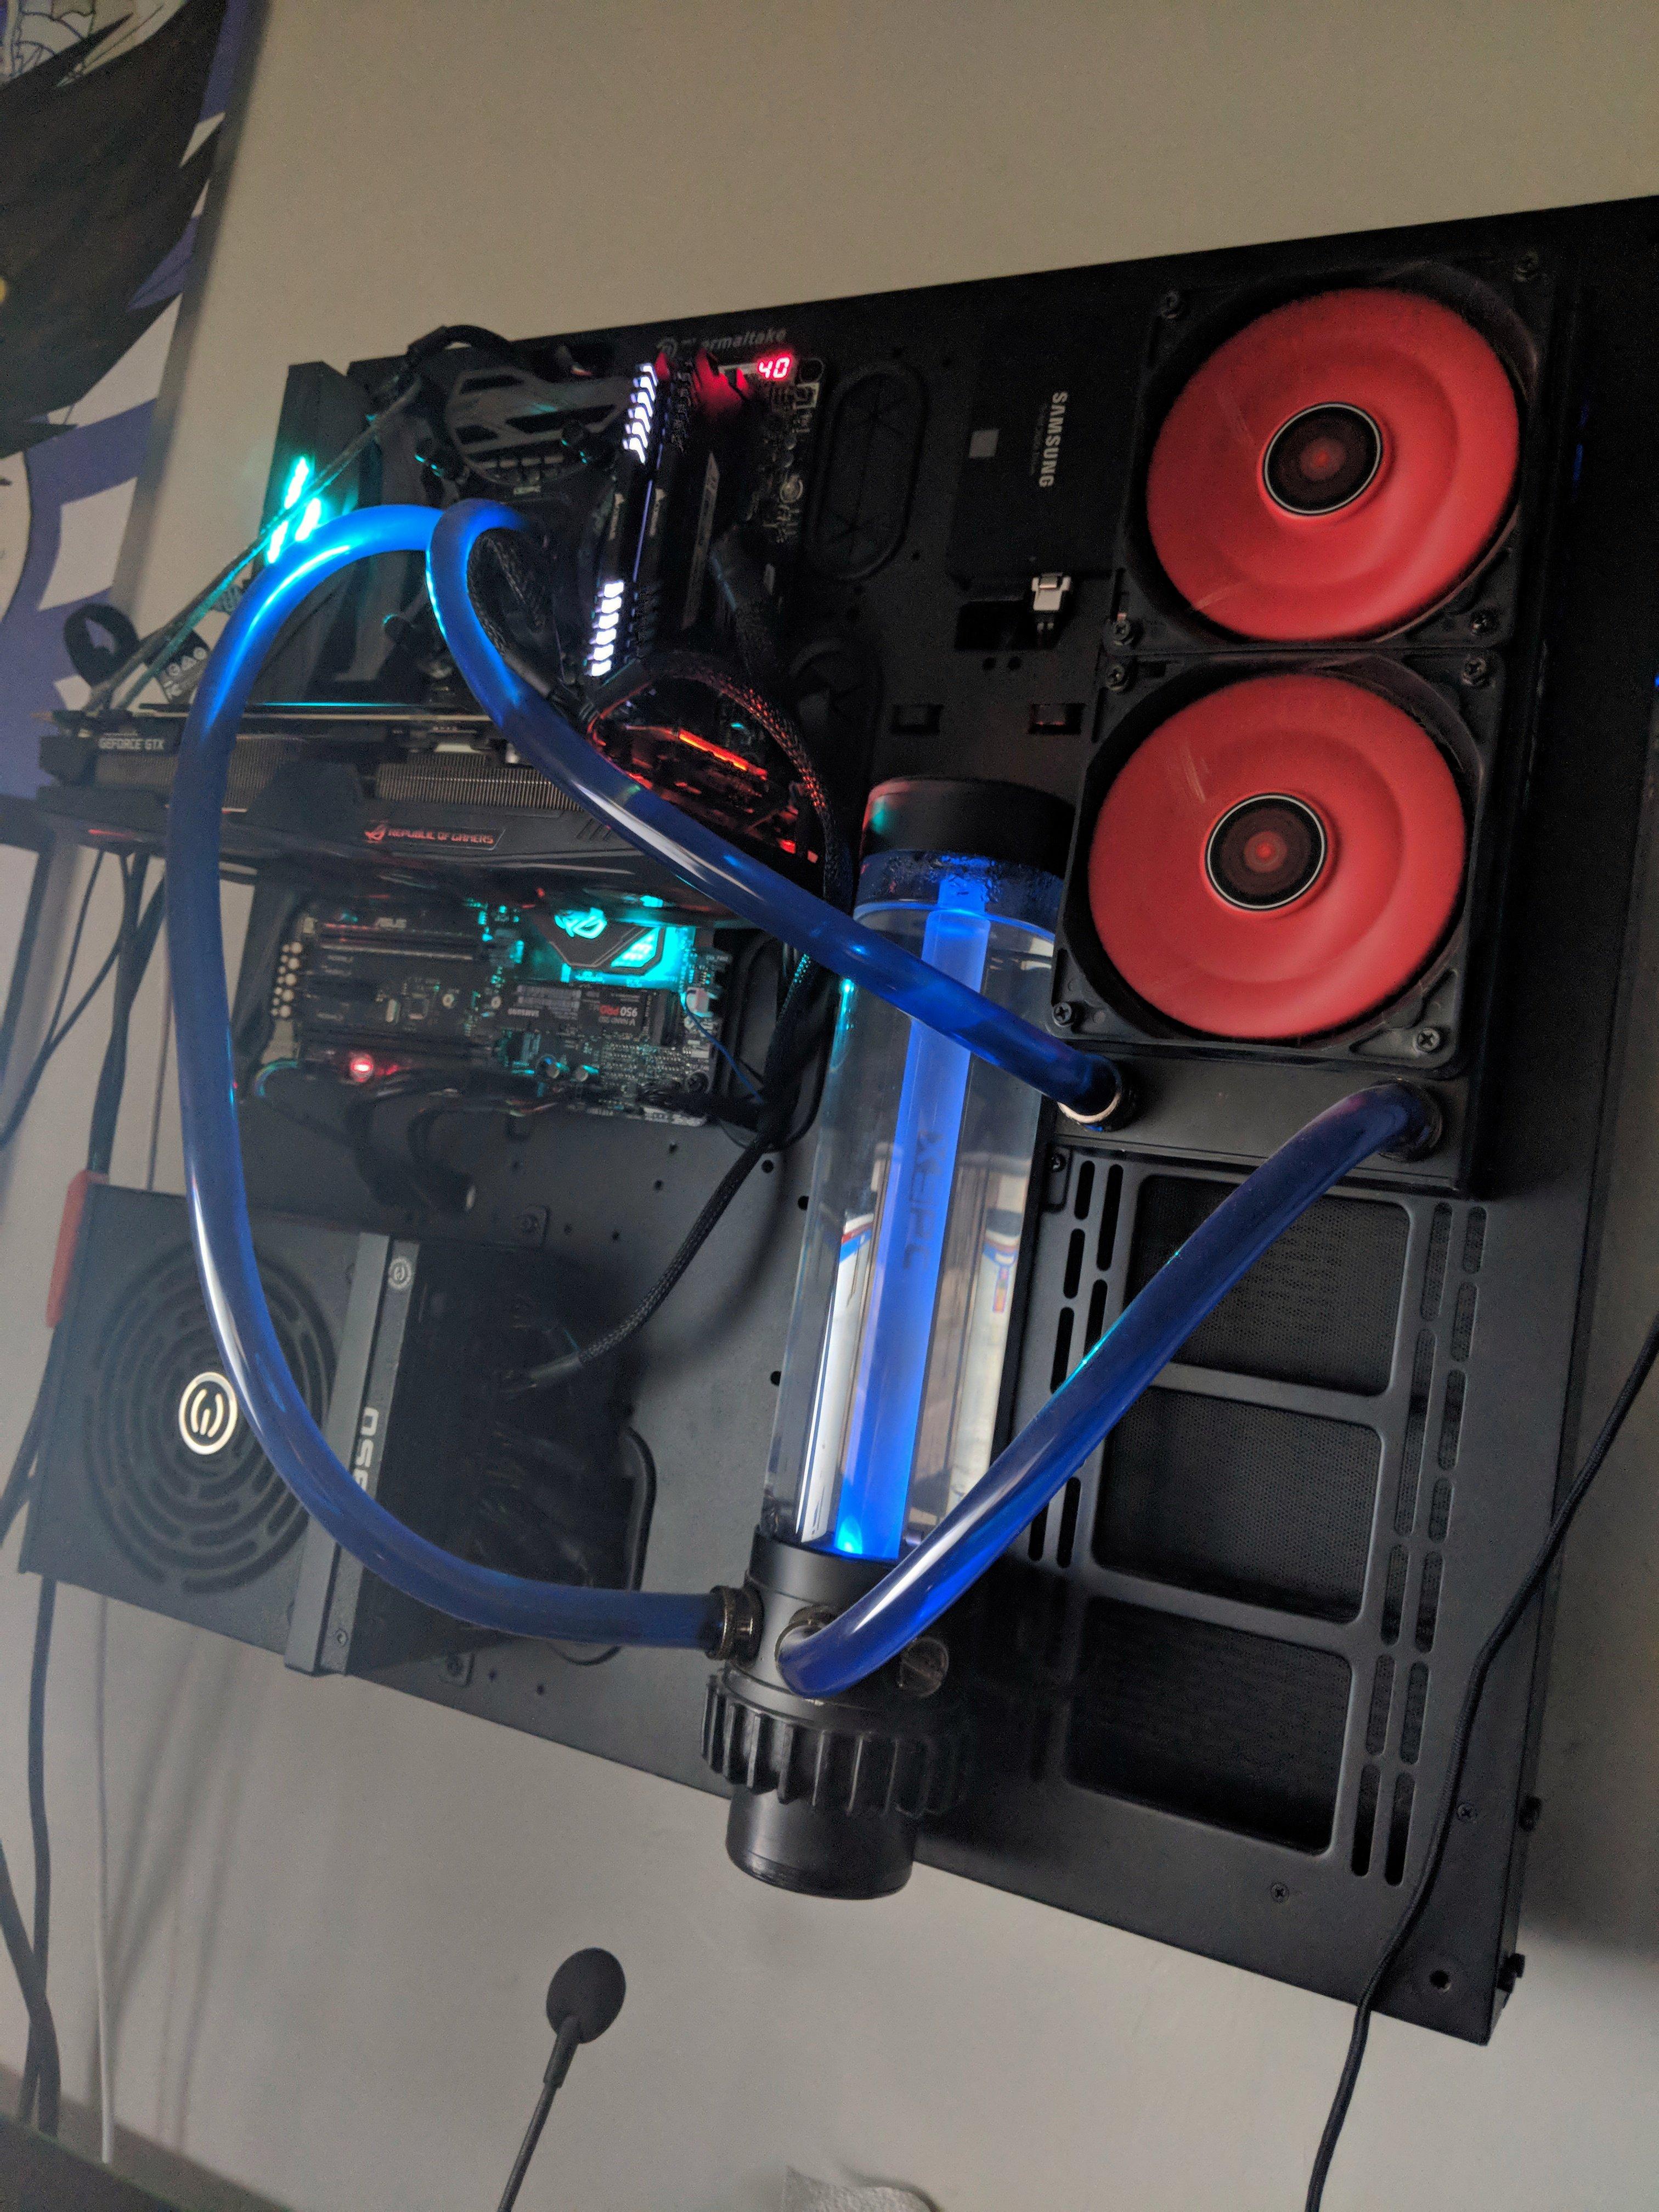 Liquid metal GPU,loop order and radiator  | Tom's Hardware Forum